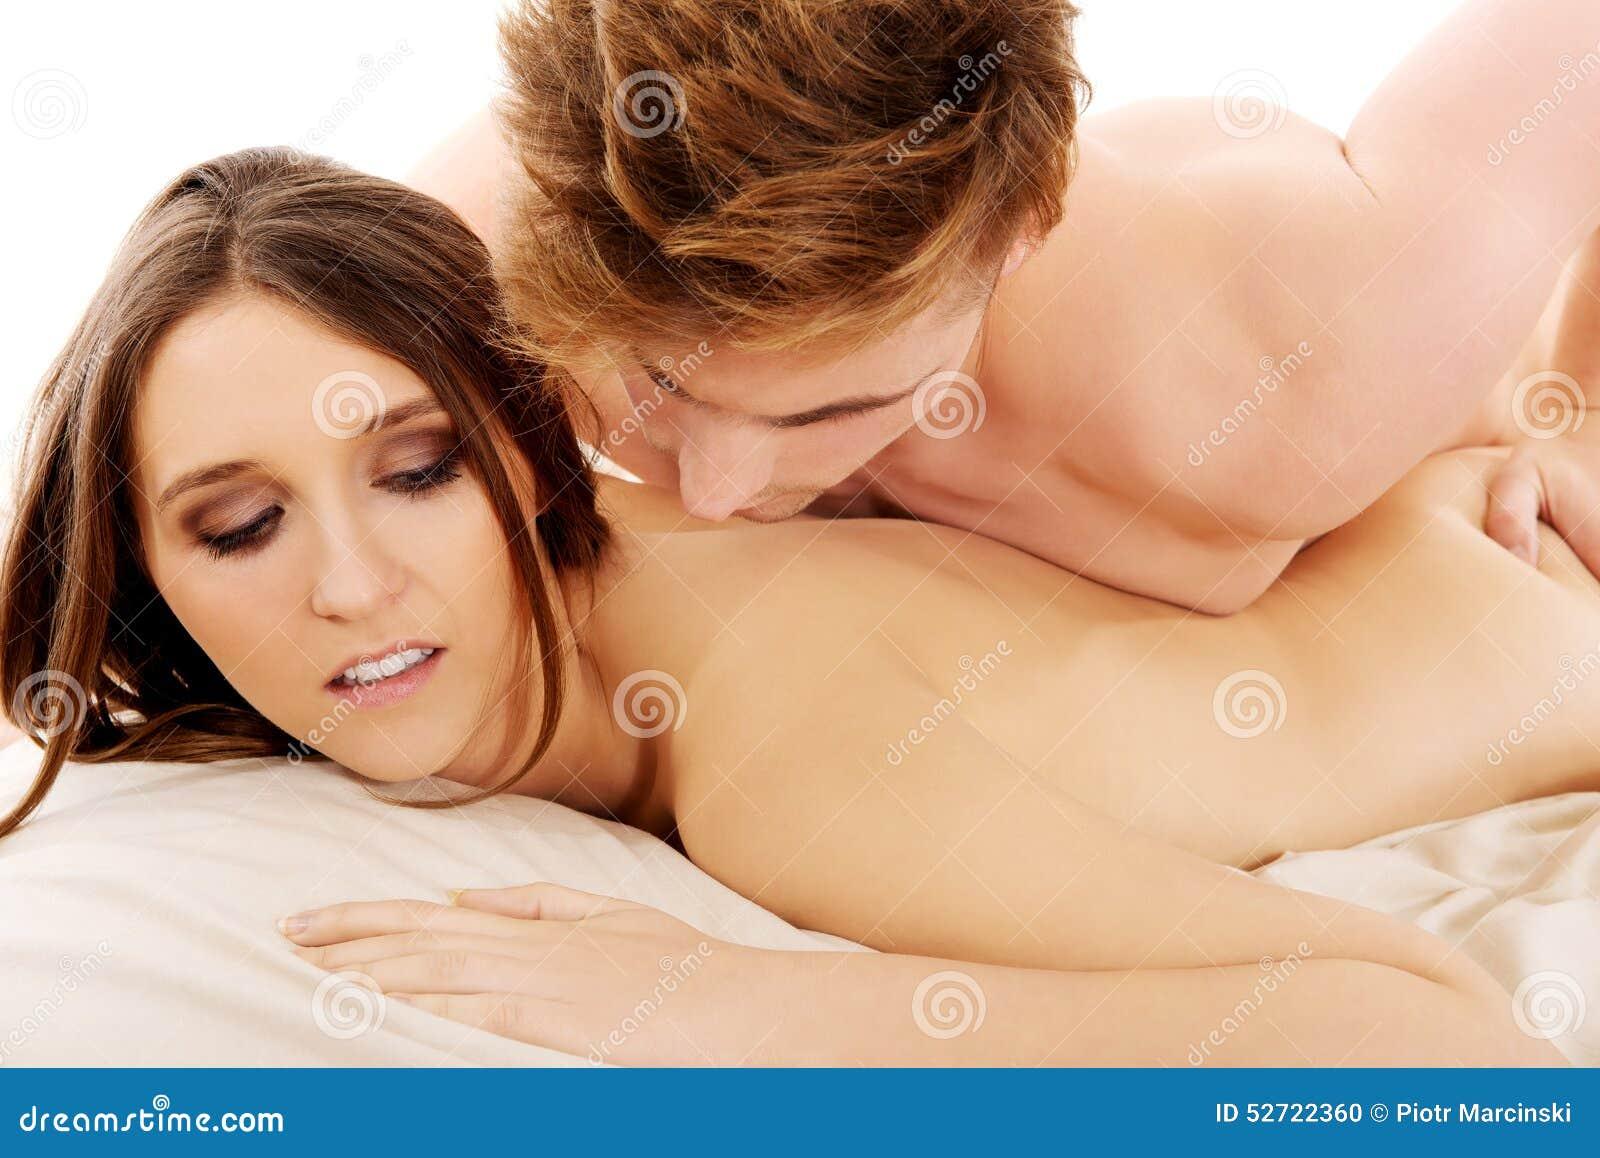 Men And Women In Bedroom Man Lying On Woman In Bedroom Stock Photo Image 52722360